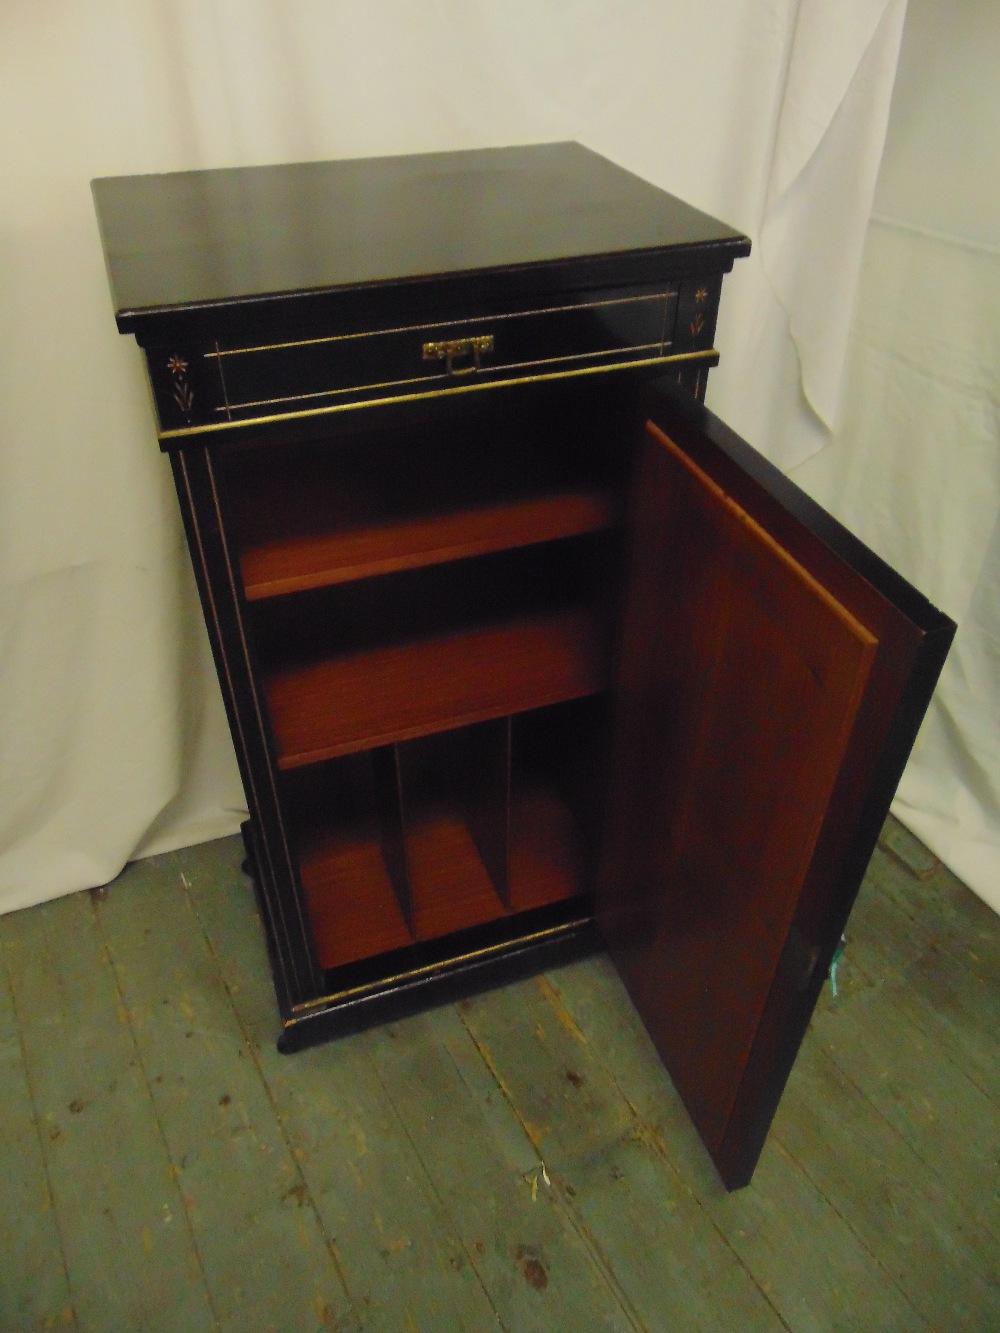 Lot 5 - An Edwardian rectangular ebonised inlaid mahogany music cabinet with bevelled mirror to hinged